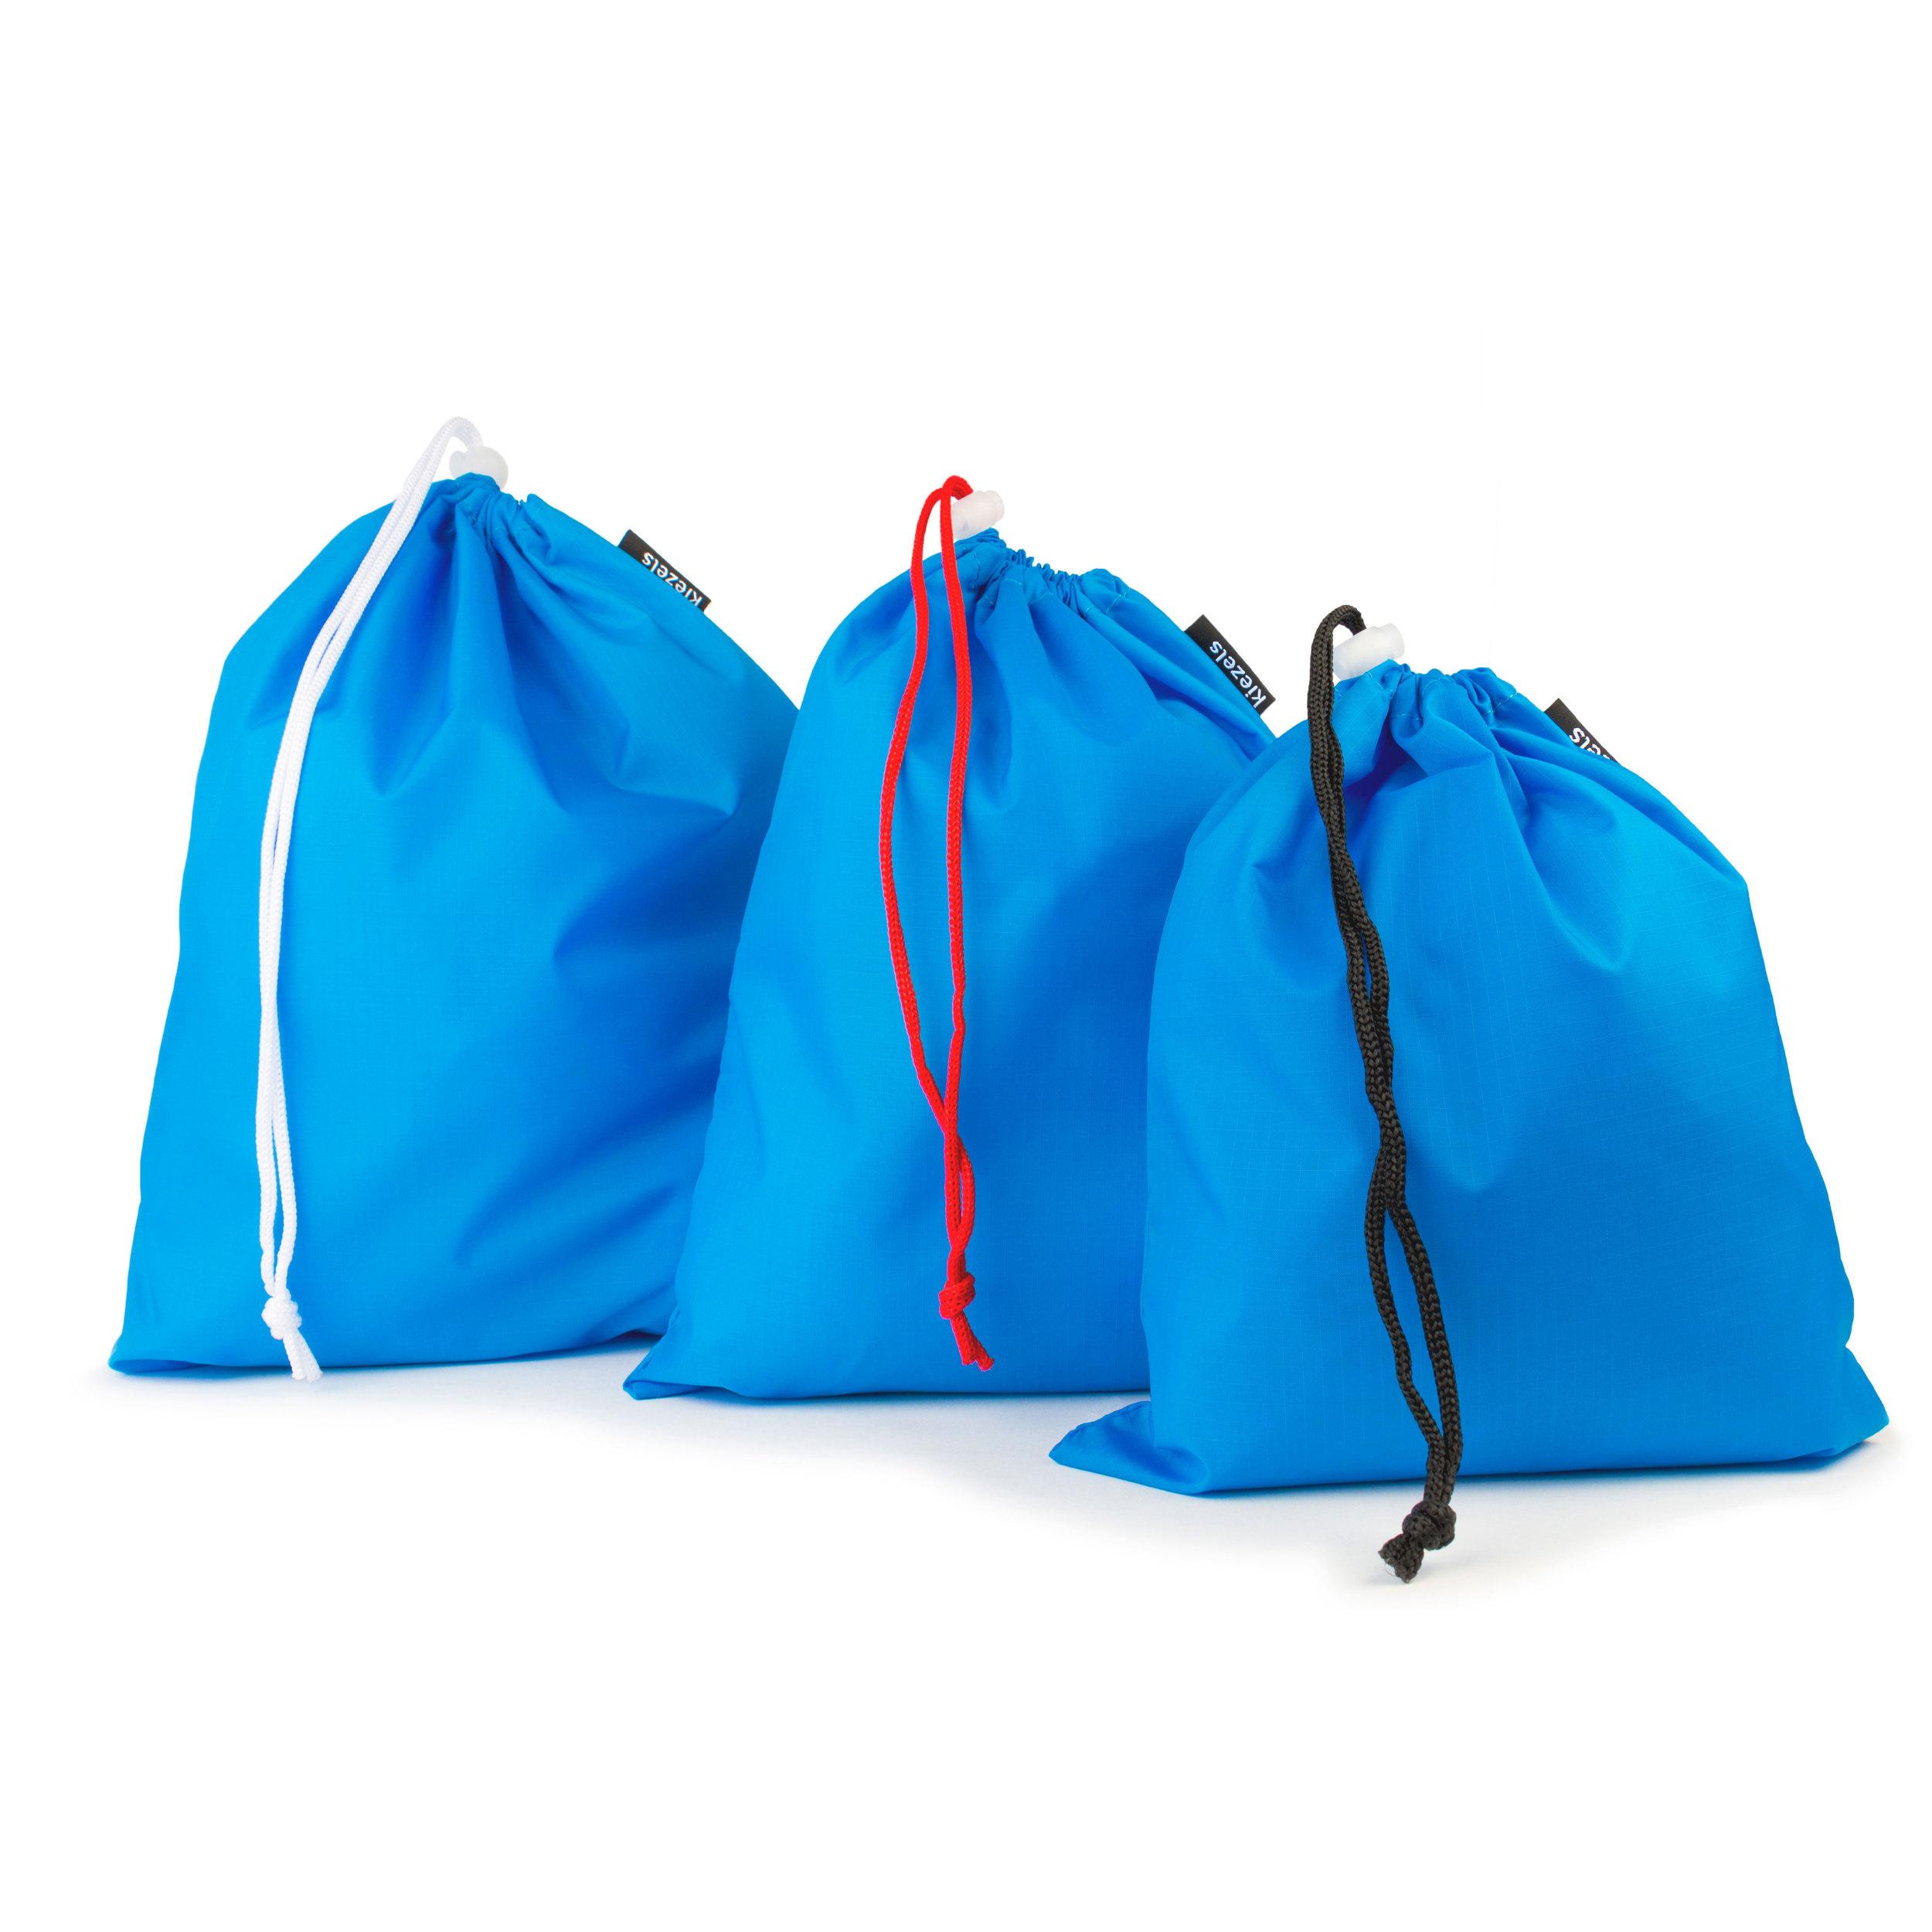 No. 207 Travel organiser bags - 3 sizes - sky blue € 17,50